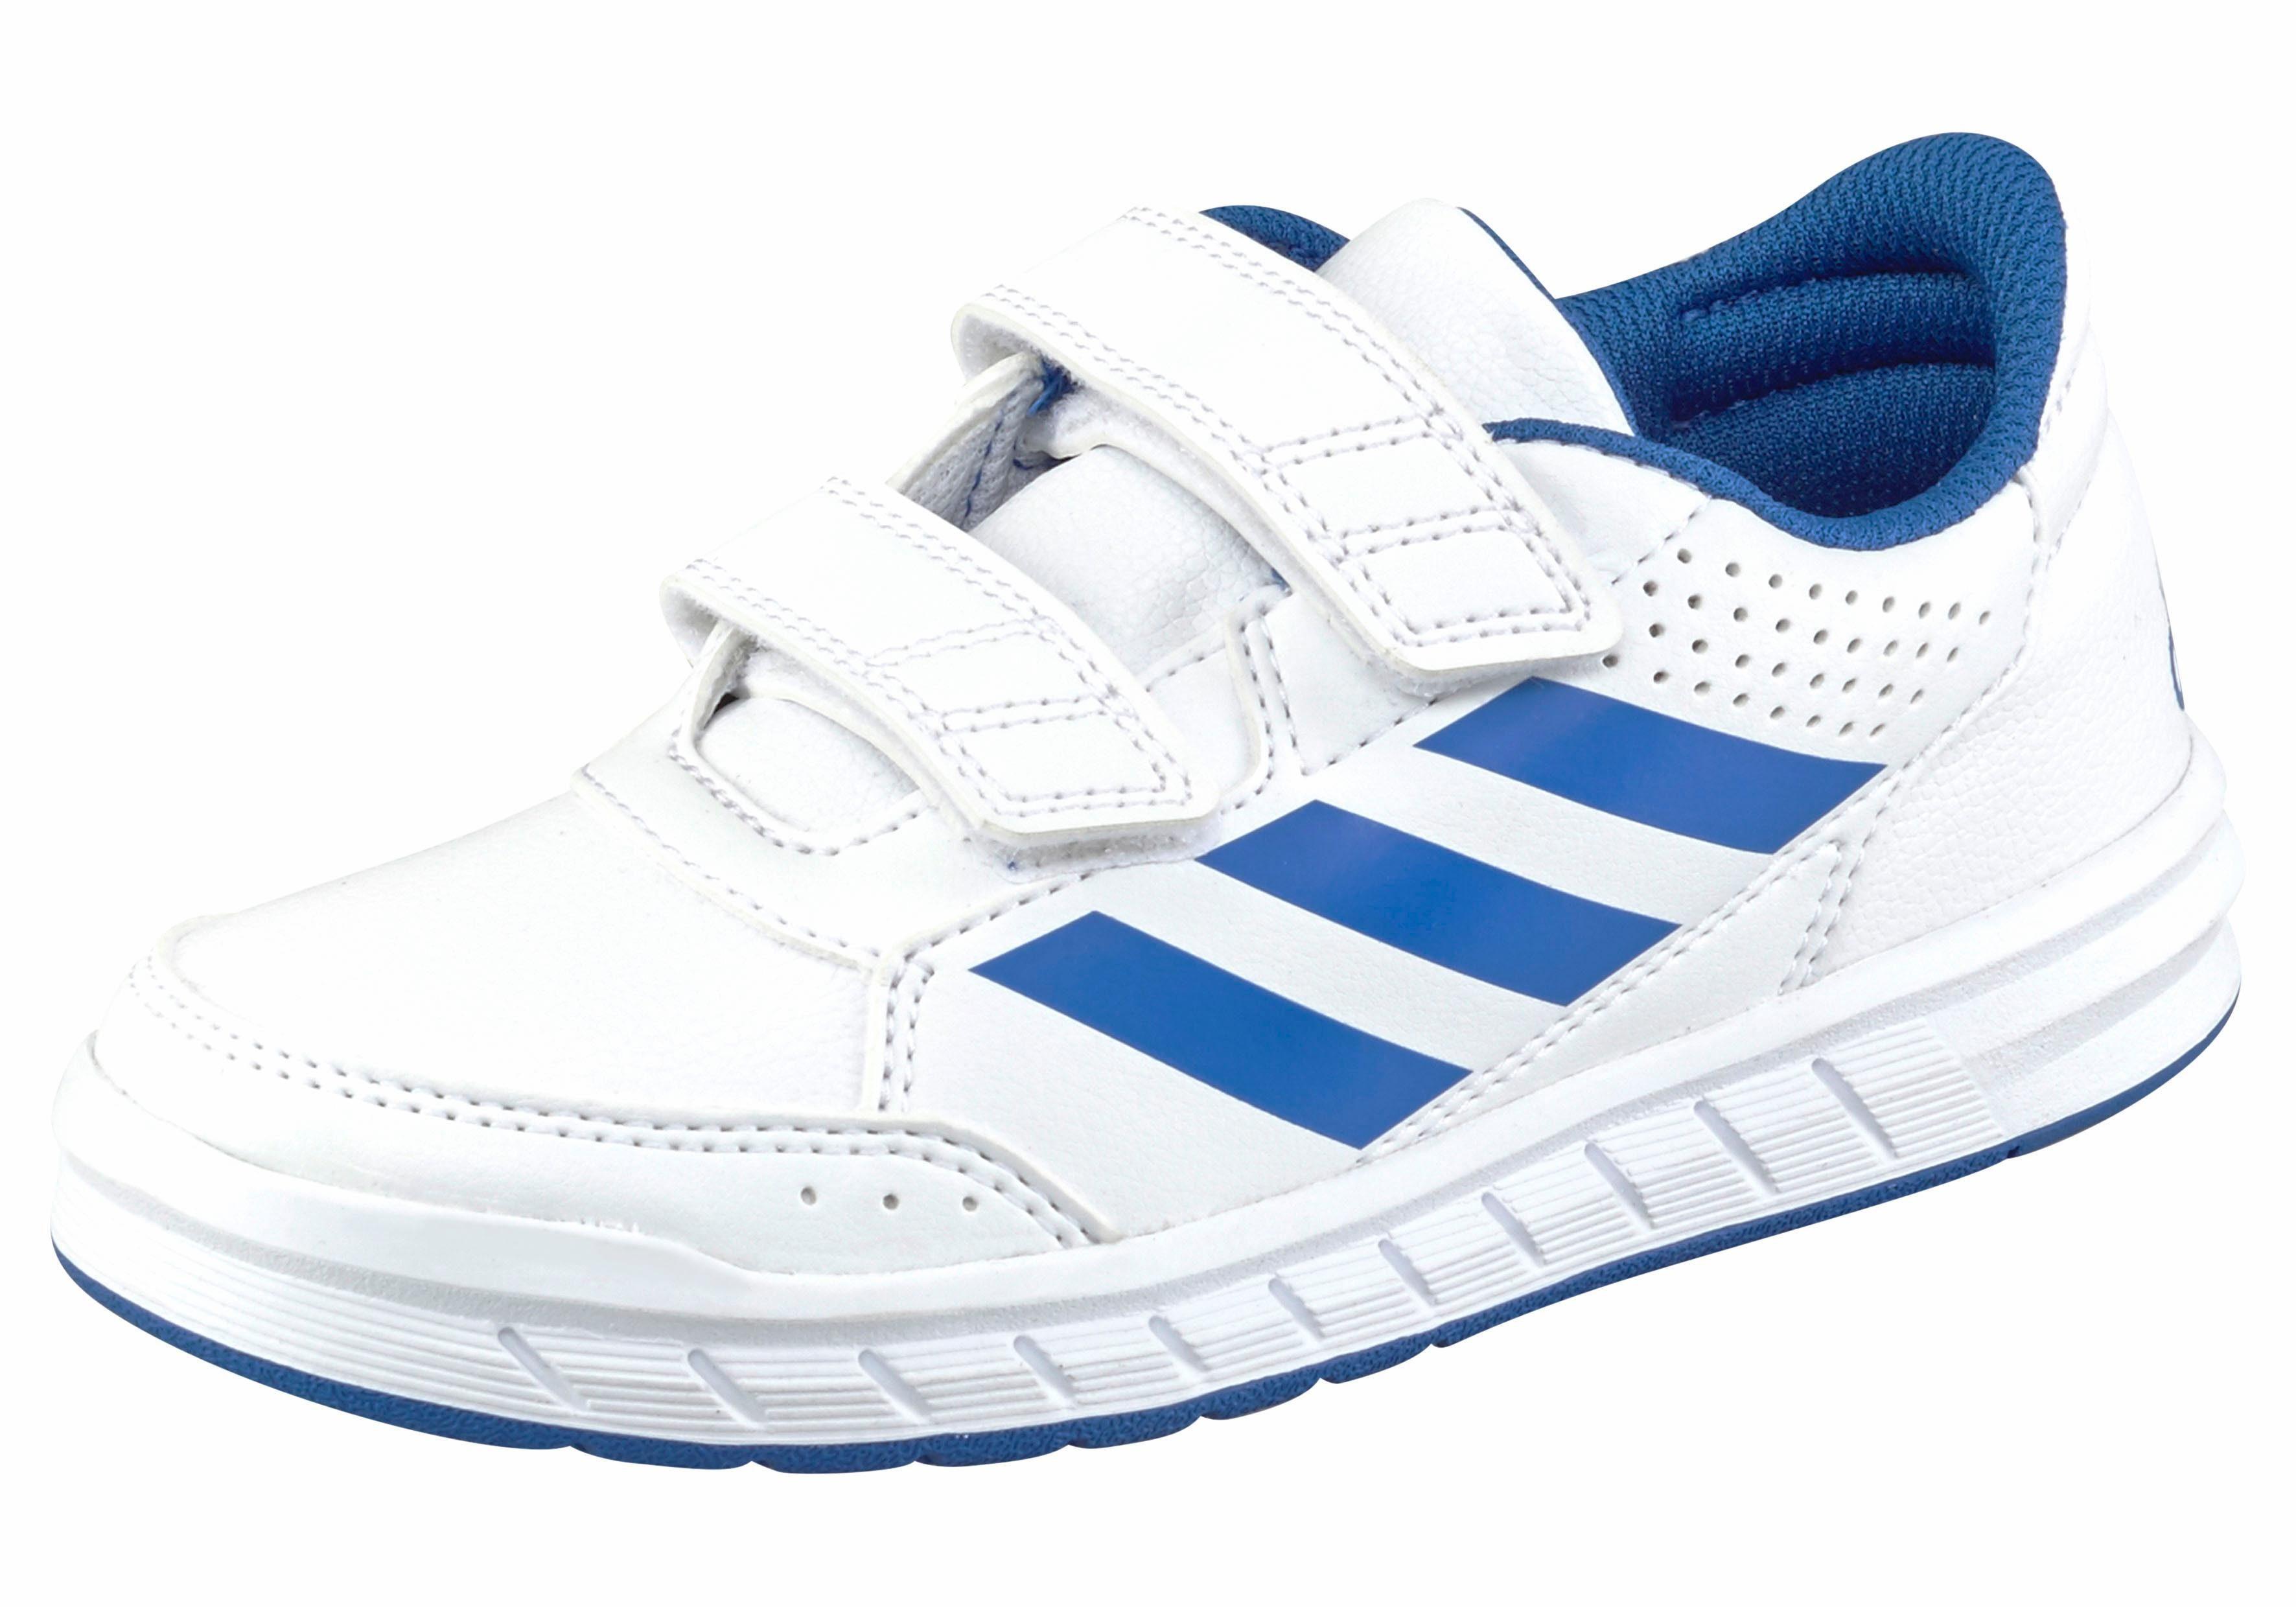 adidas schoenen snel kapot